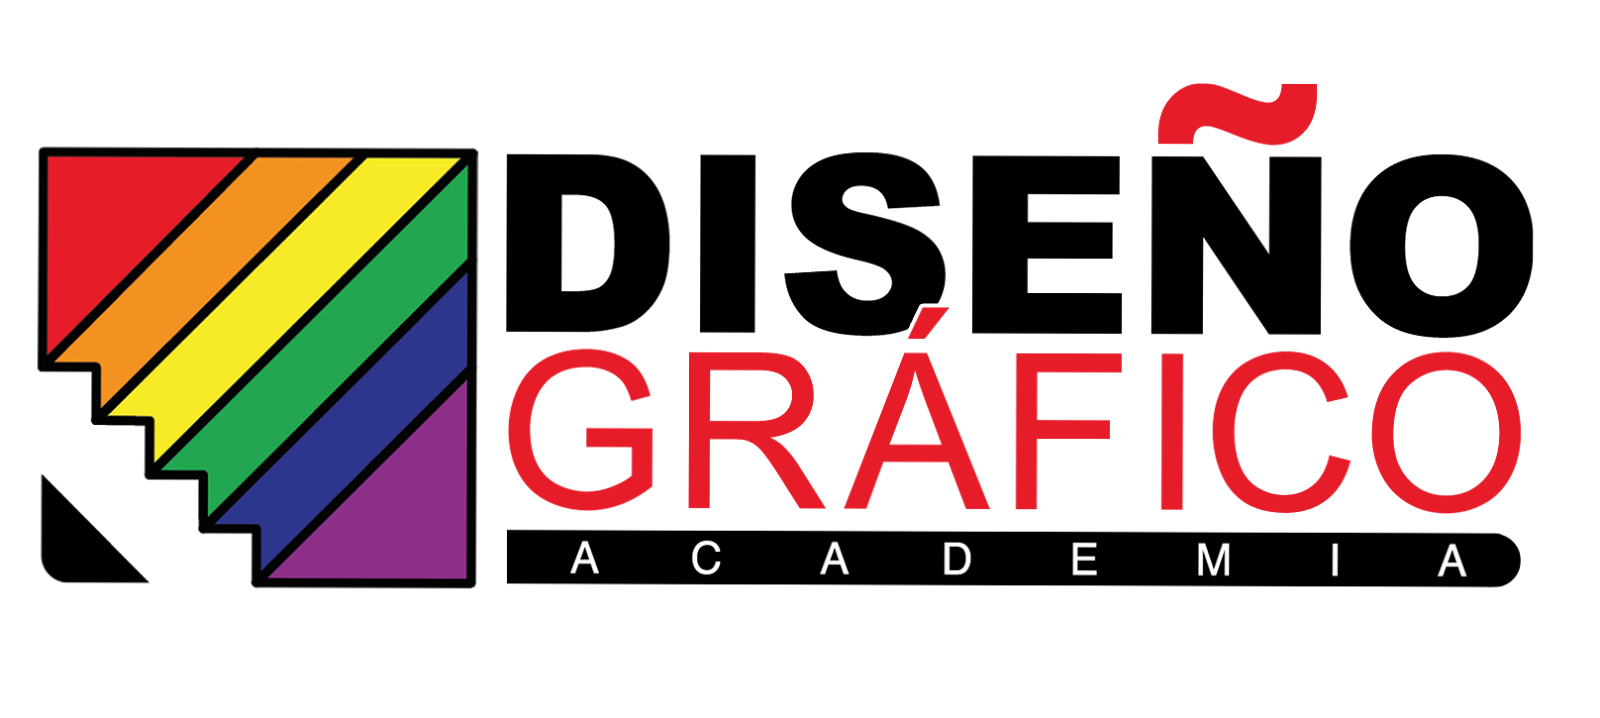 Intercampi 2015 dise o gr fico for Diseno grafico universidades